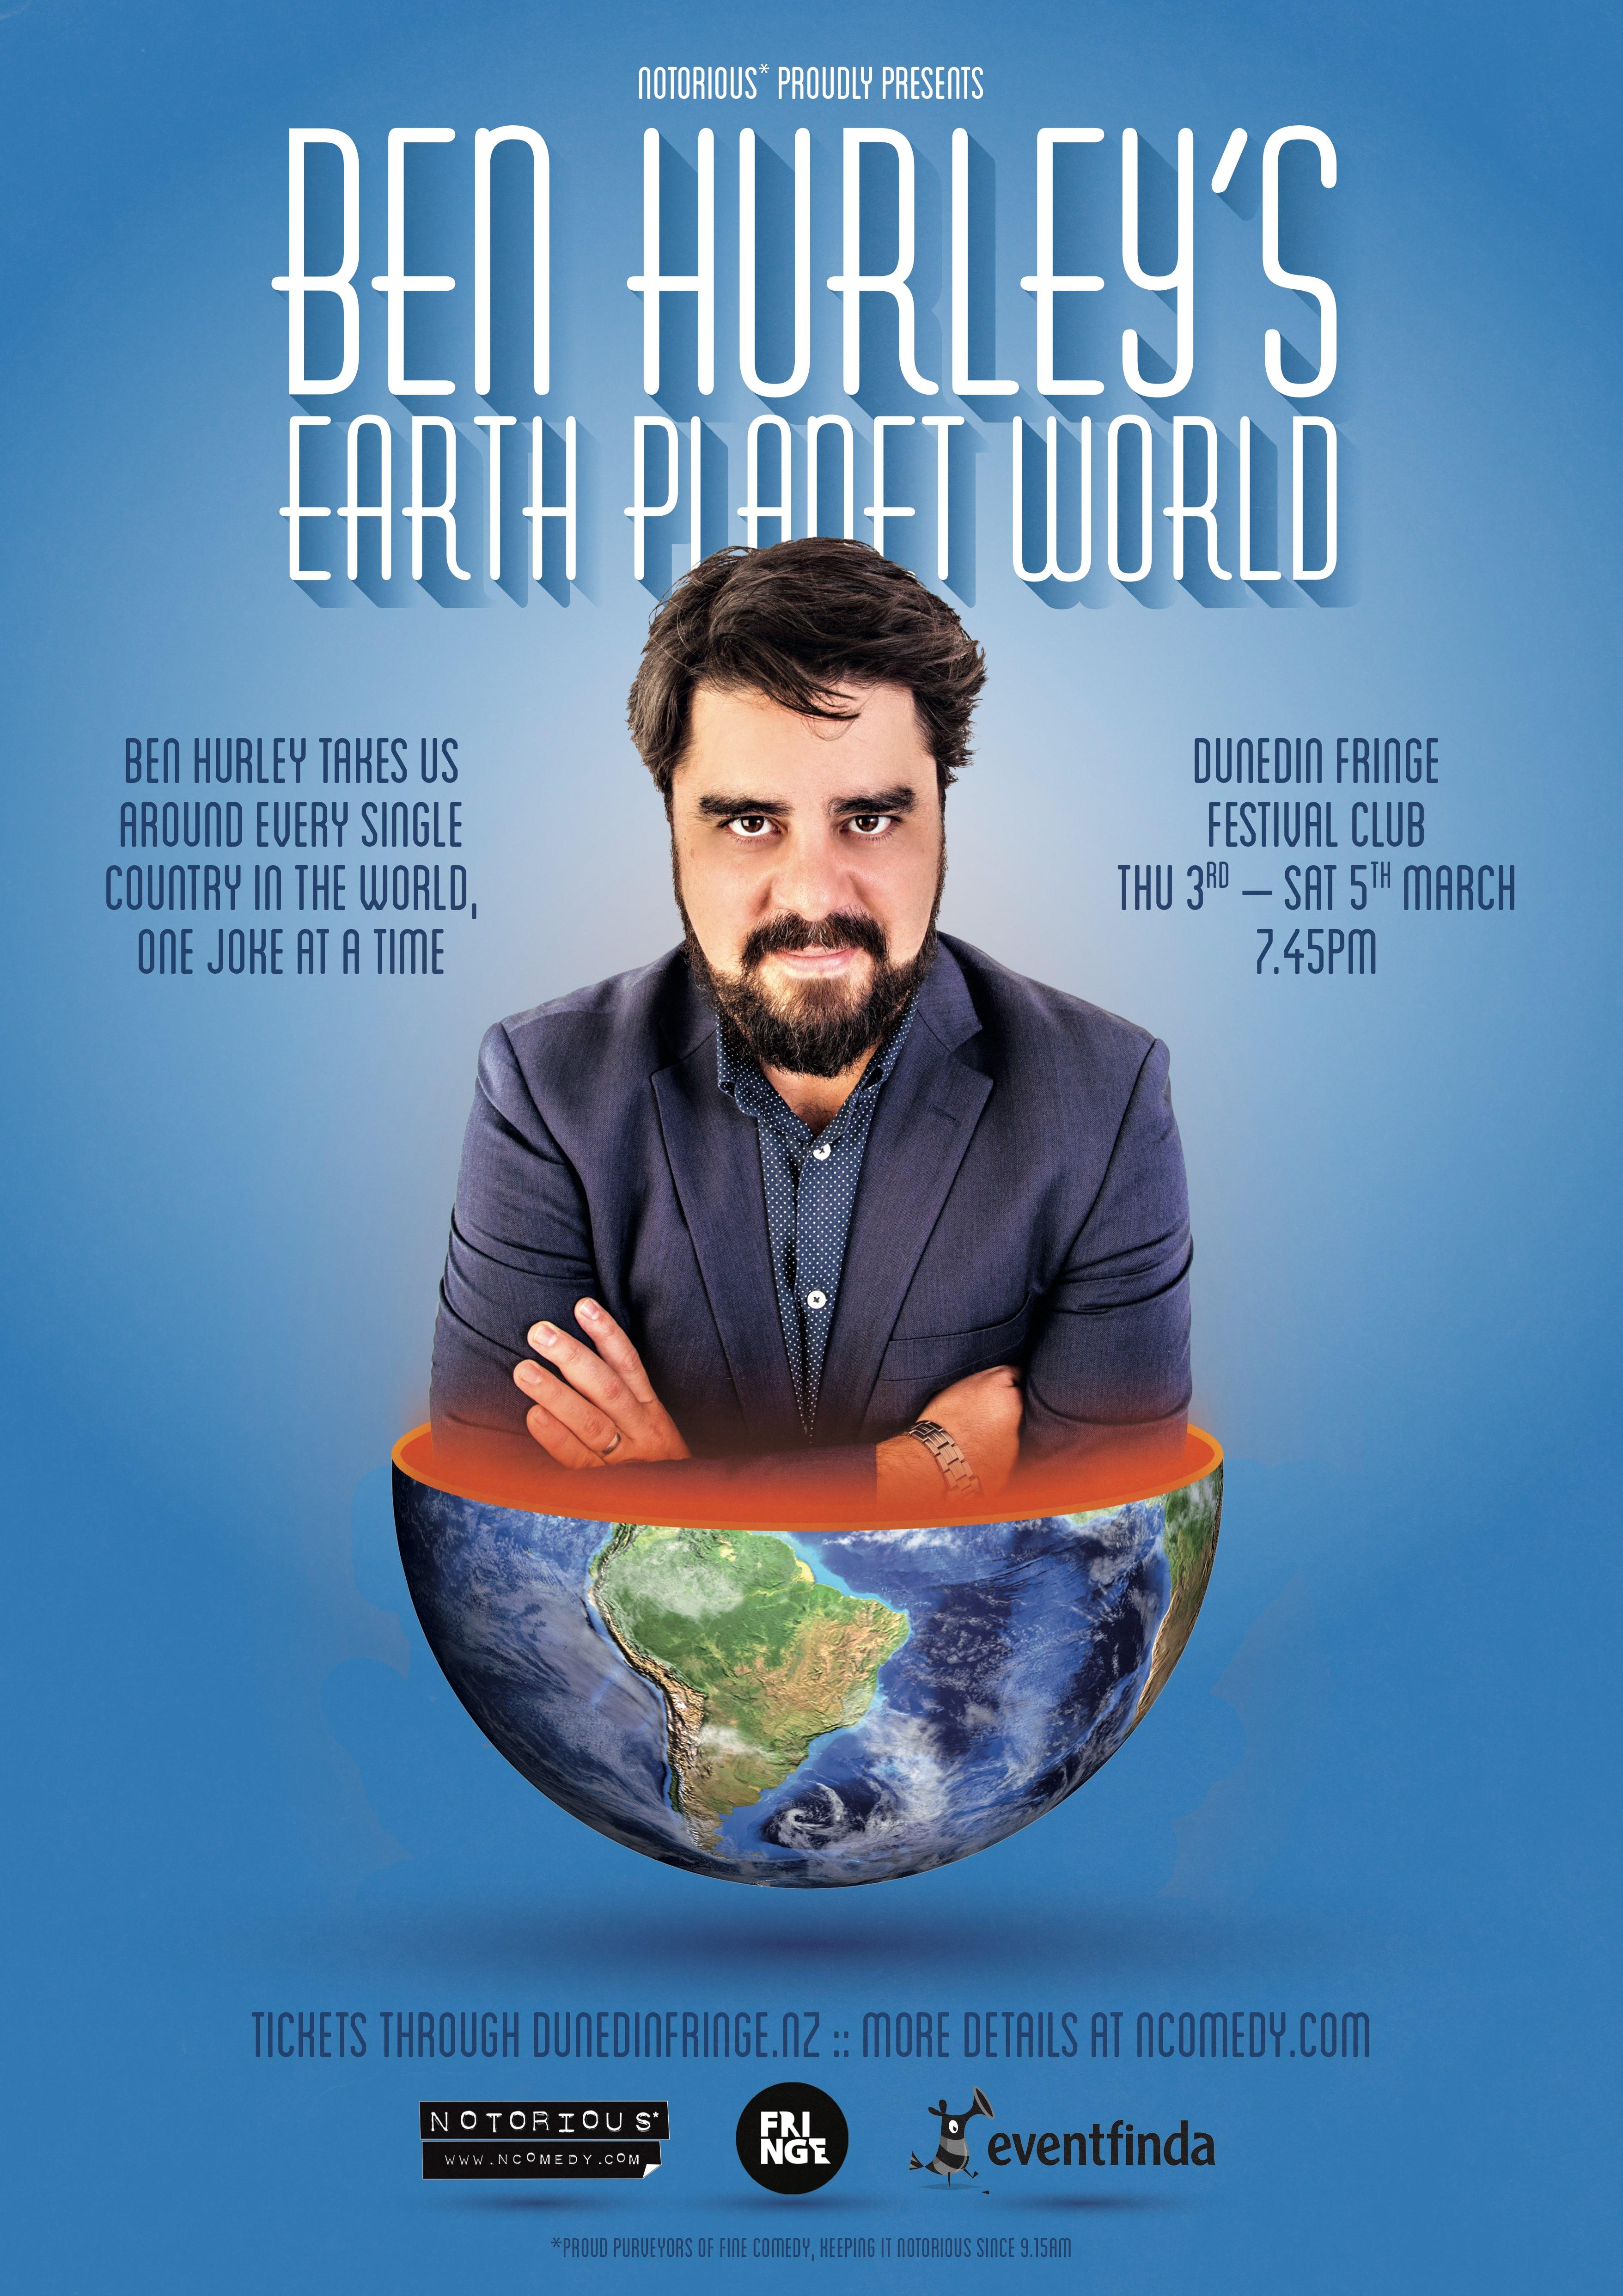 44.1 Ben Hurley EPW Dunedin Fringe poster